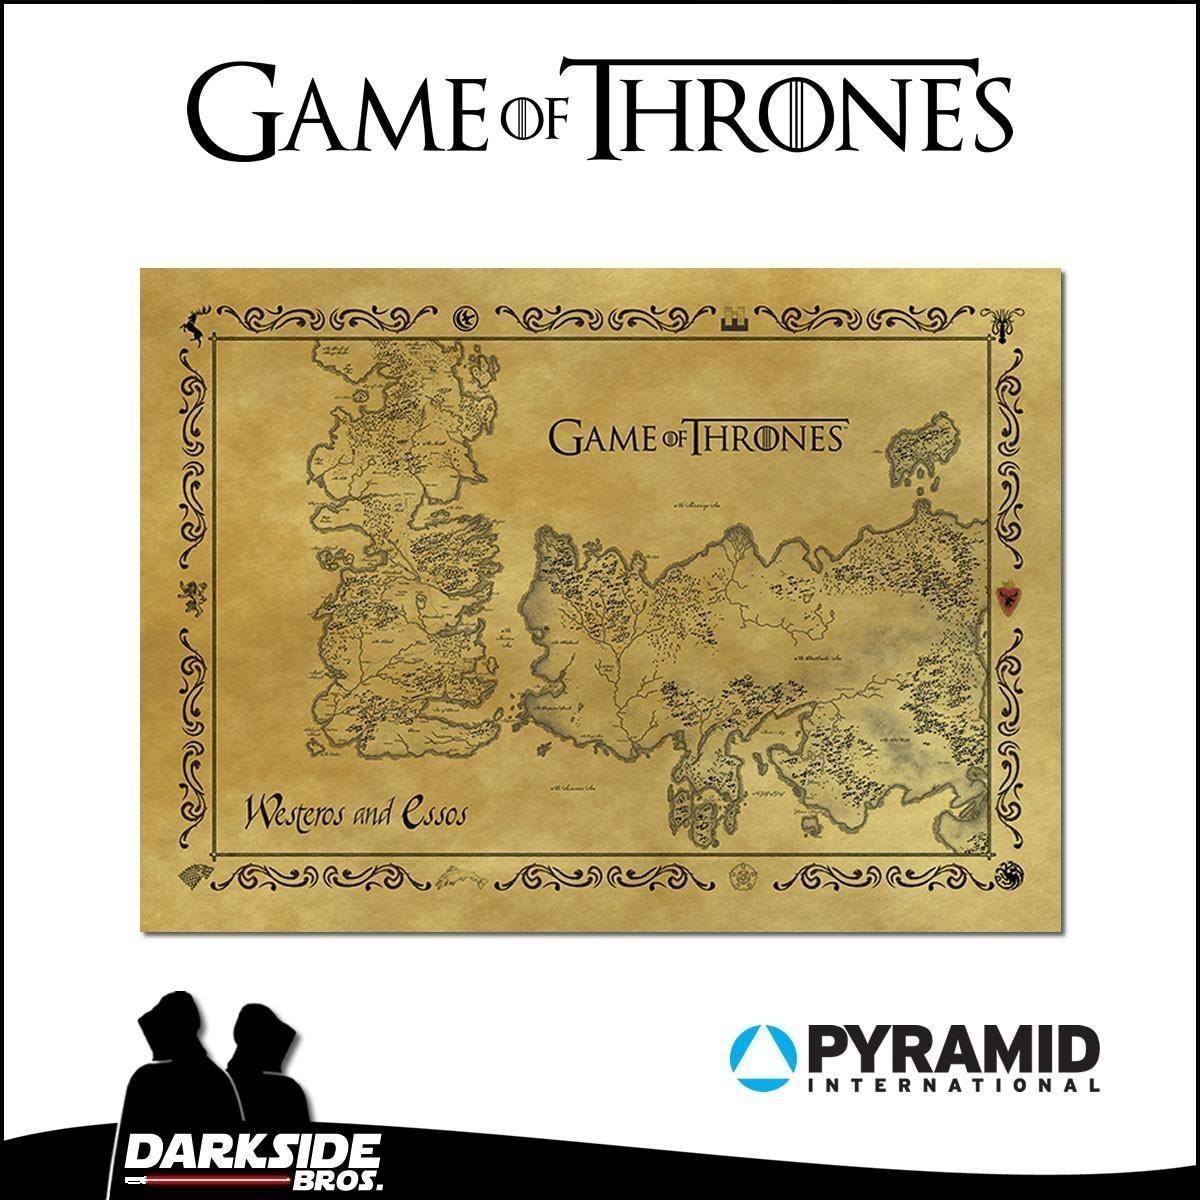 Game of Thrones Antique Map Postcard